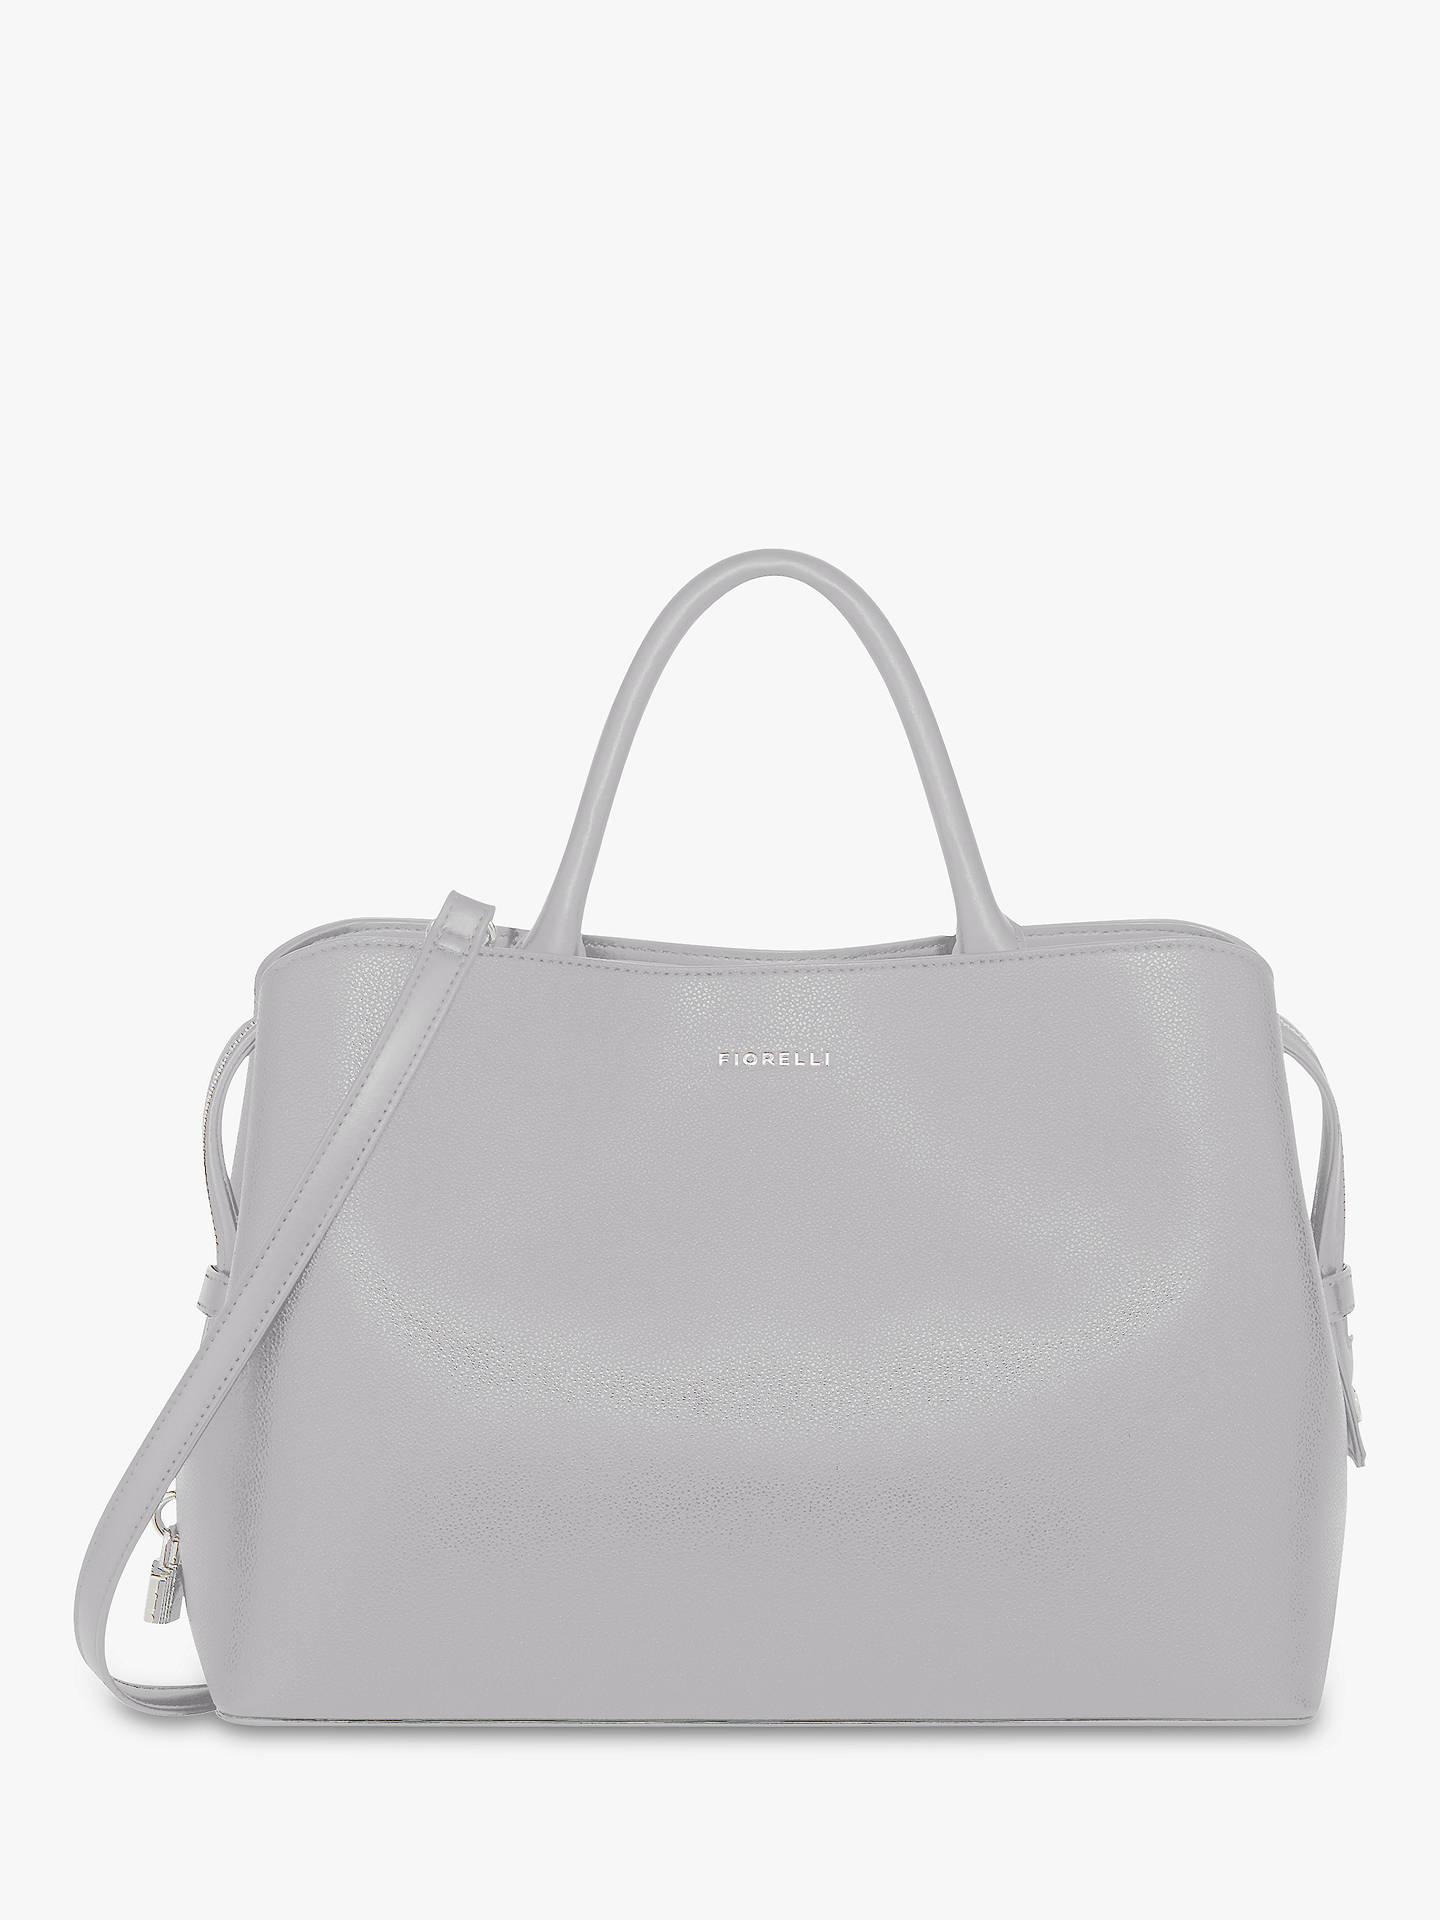 c15e0c0a69ba Buy Fiorelli Bethnal Triple Compartment Grab Bag, Light Grey Online at  johnlewis.com ...